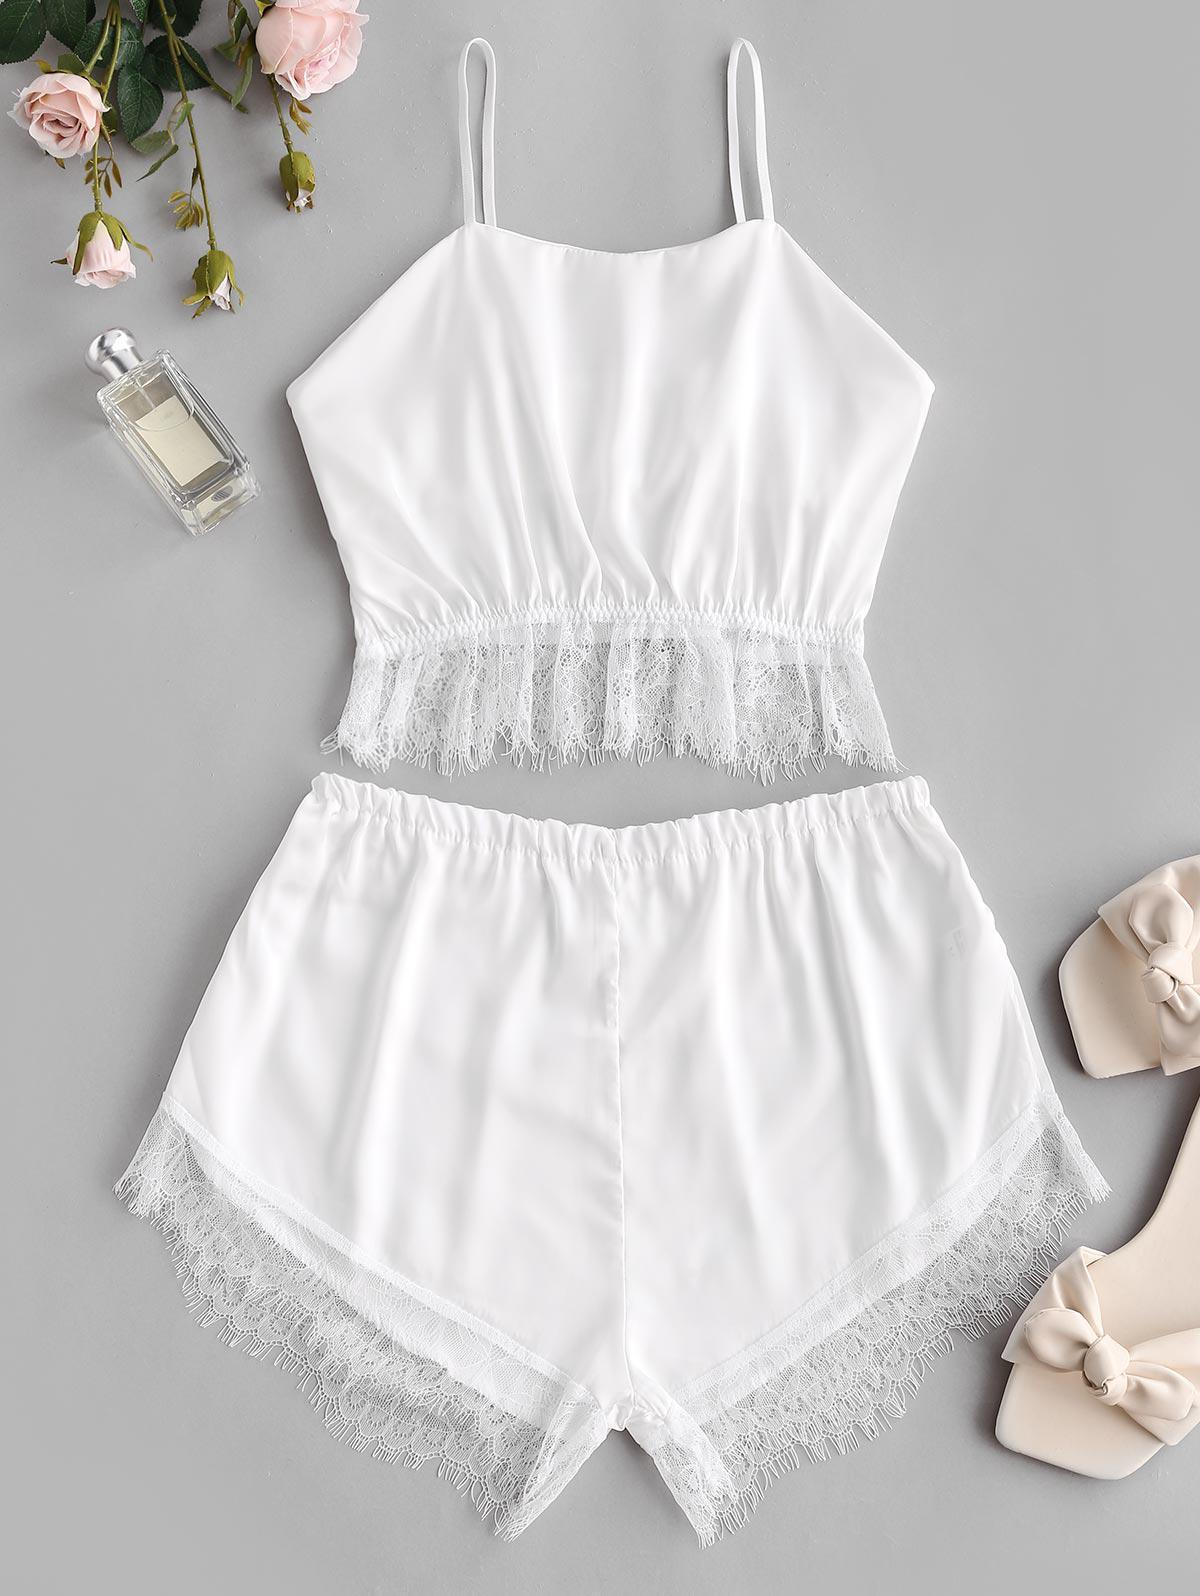 Lace and Satin Silky Short Pajama Set